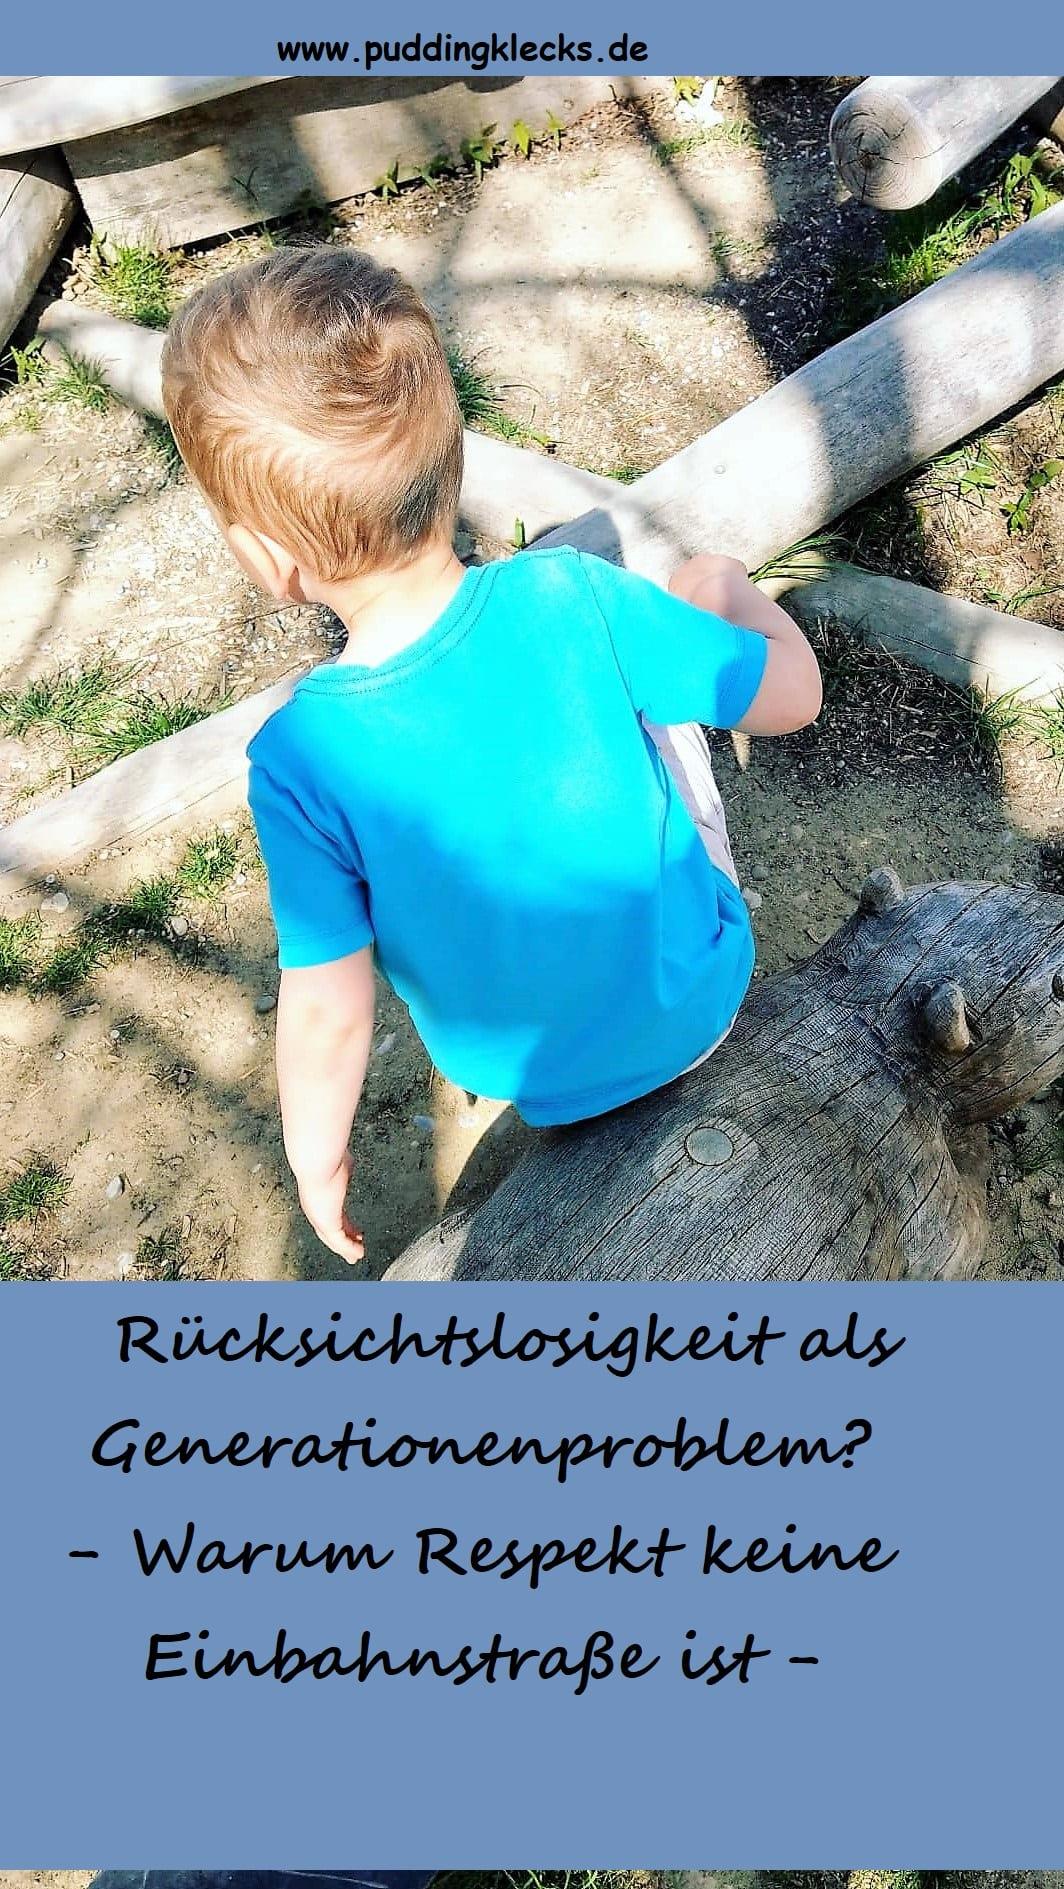 Erziehung, respektvoller Umgang, Rücksicht, Rücksichtnahme, Generation, Generationenproblem, Mama, Kind sein, Kindheit